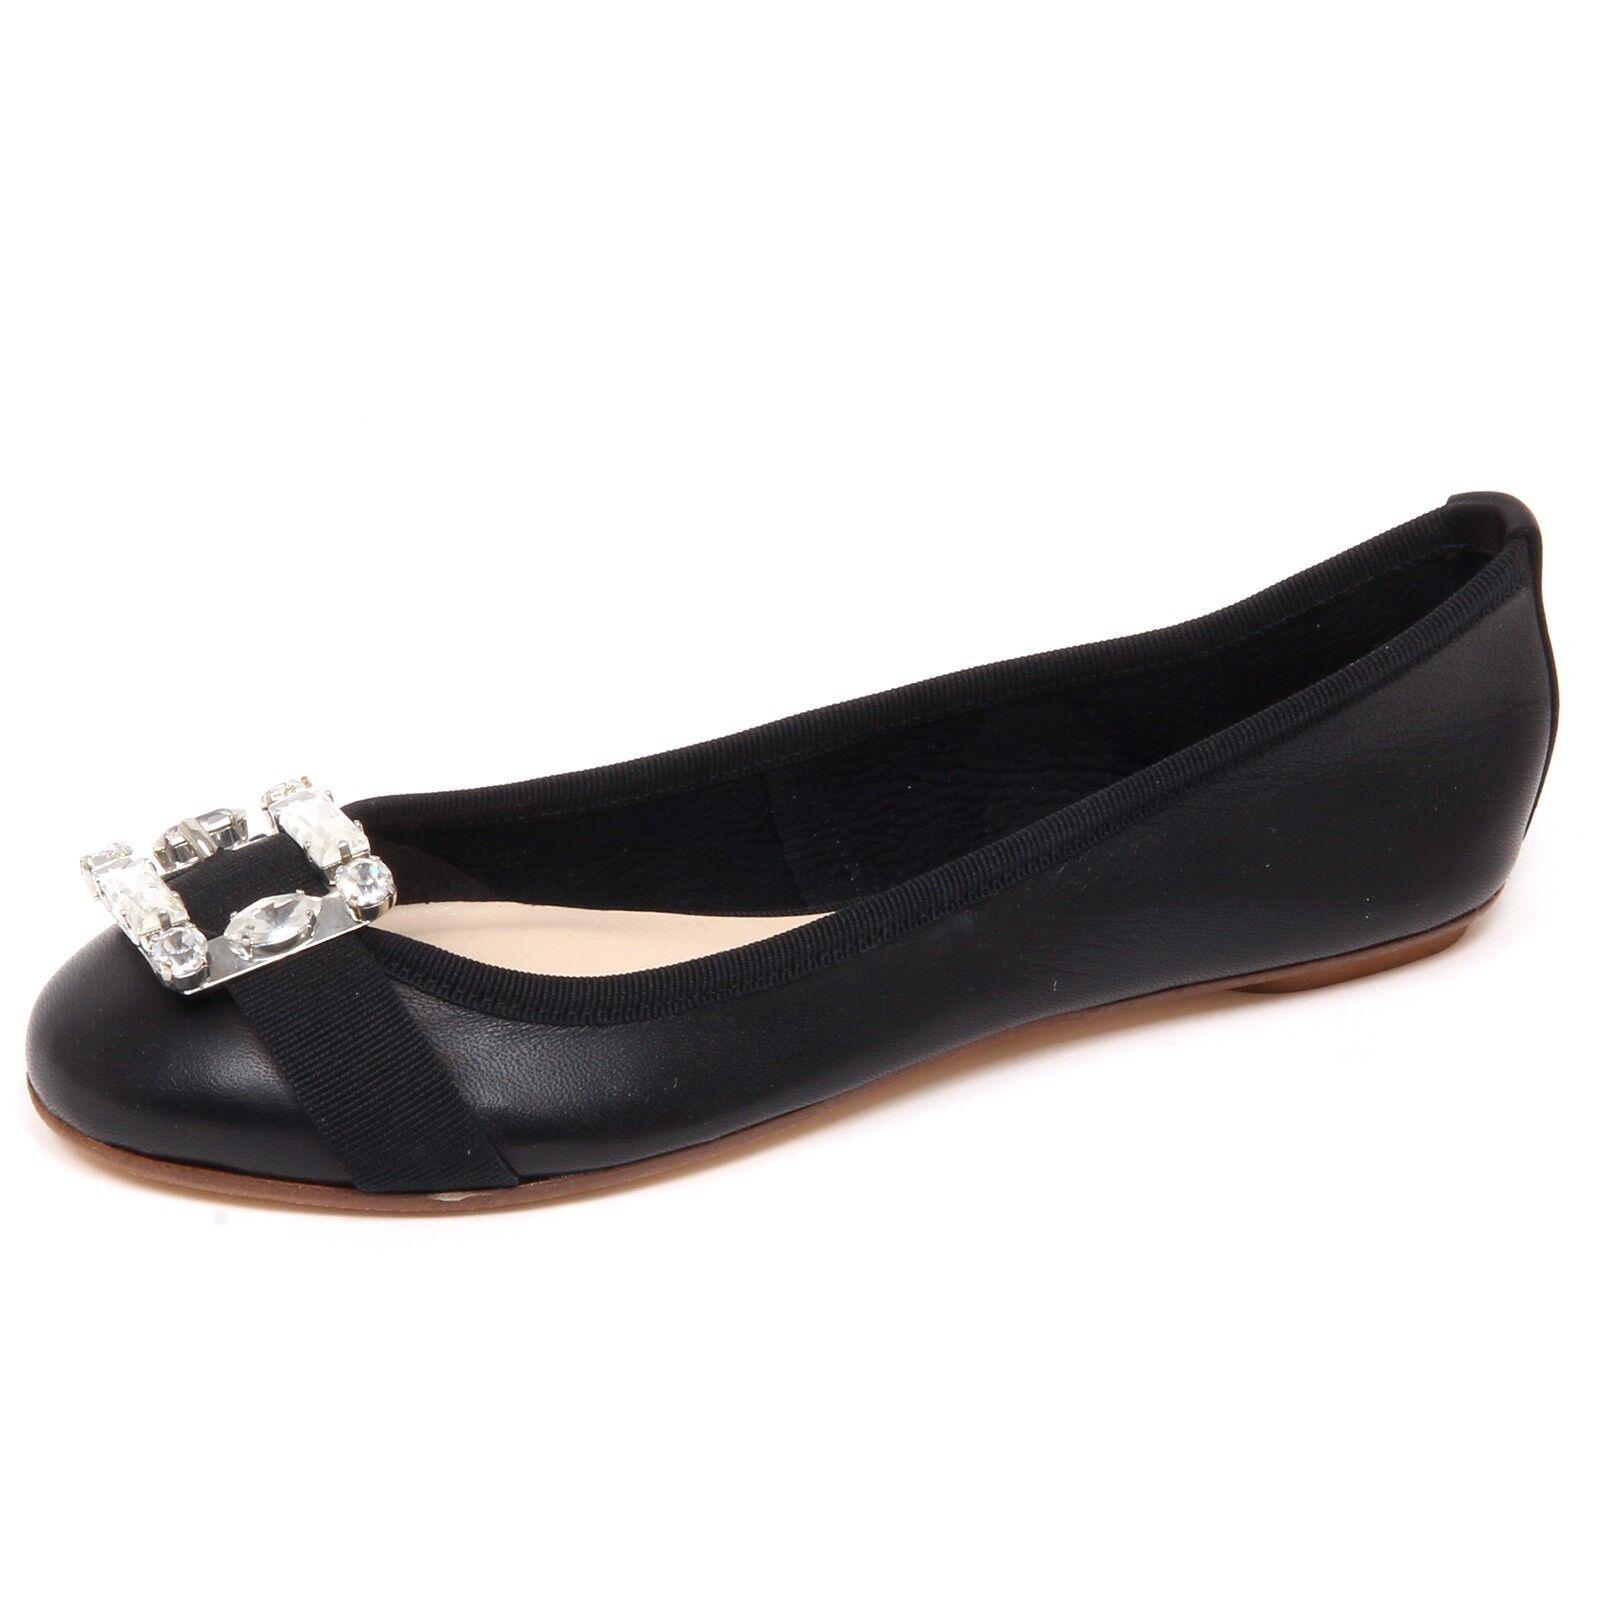 F3732 Negro Anna Baiguera annetteflex Bailarina mujer mujer mujer zapatos Zapatos Mujer  ahorra hasta un 70%